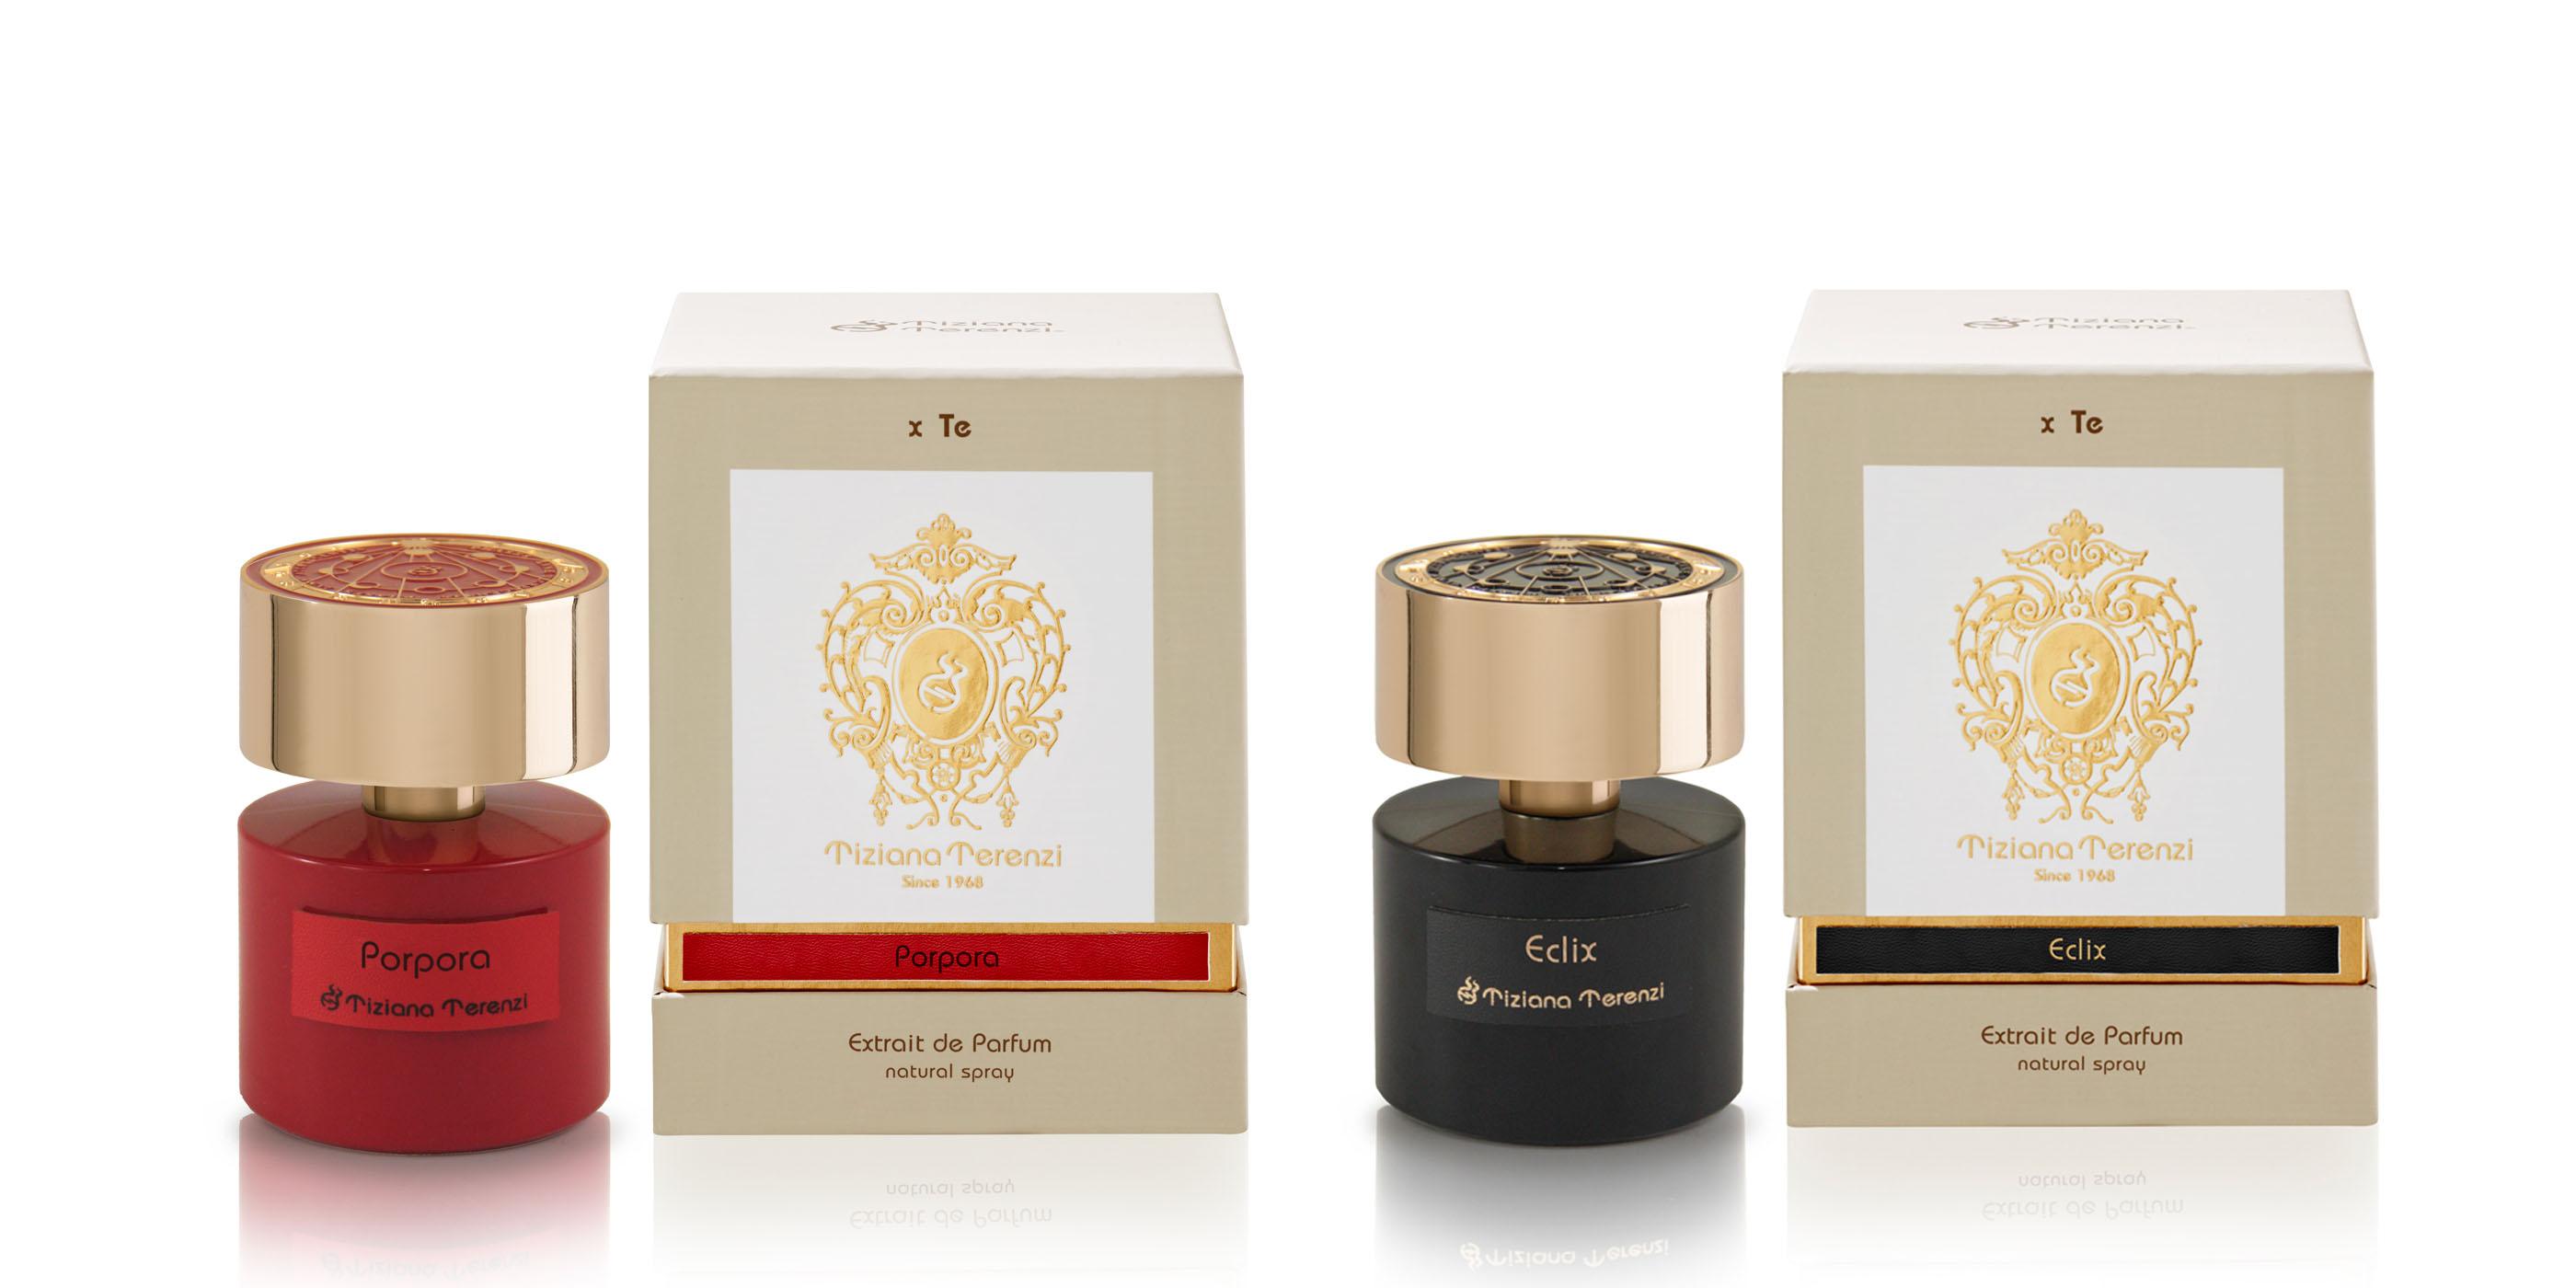 Tiziana Terenzi Eclips & Porpora parfum fall 2017